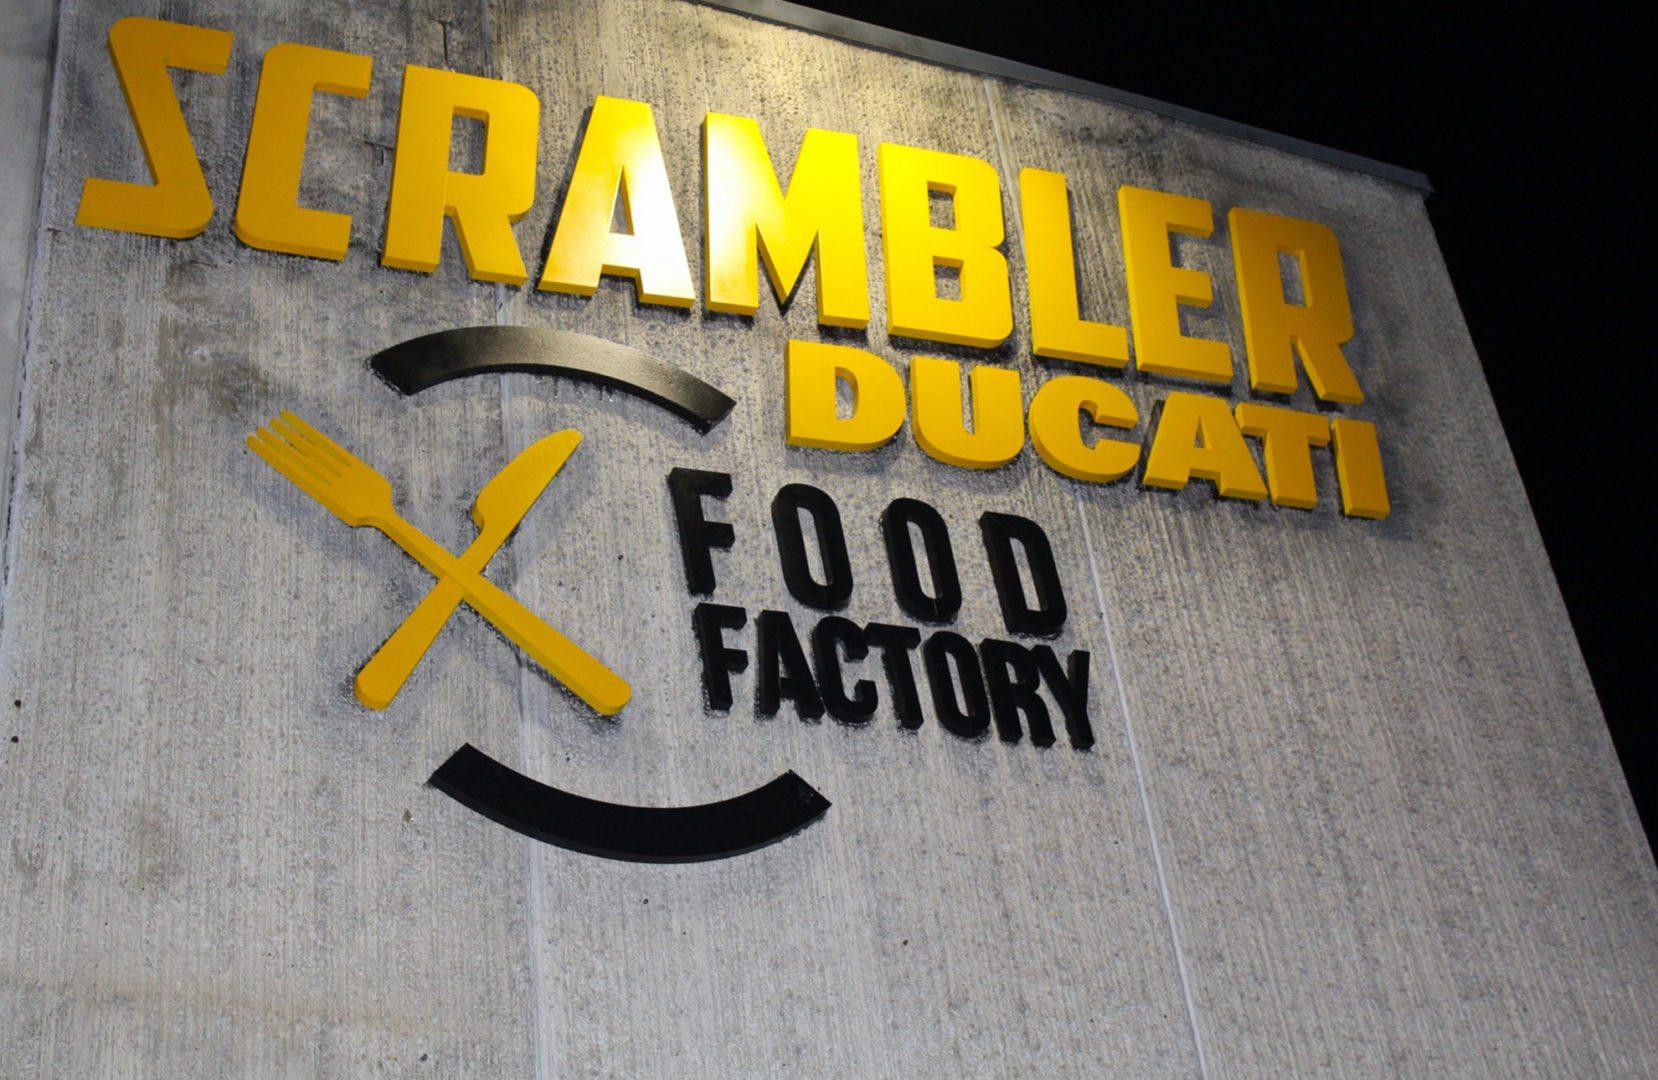 Bologna Scrambler Food Factory:esterno